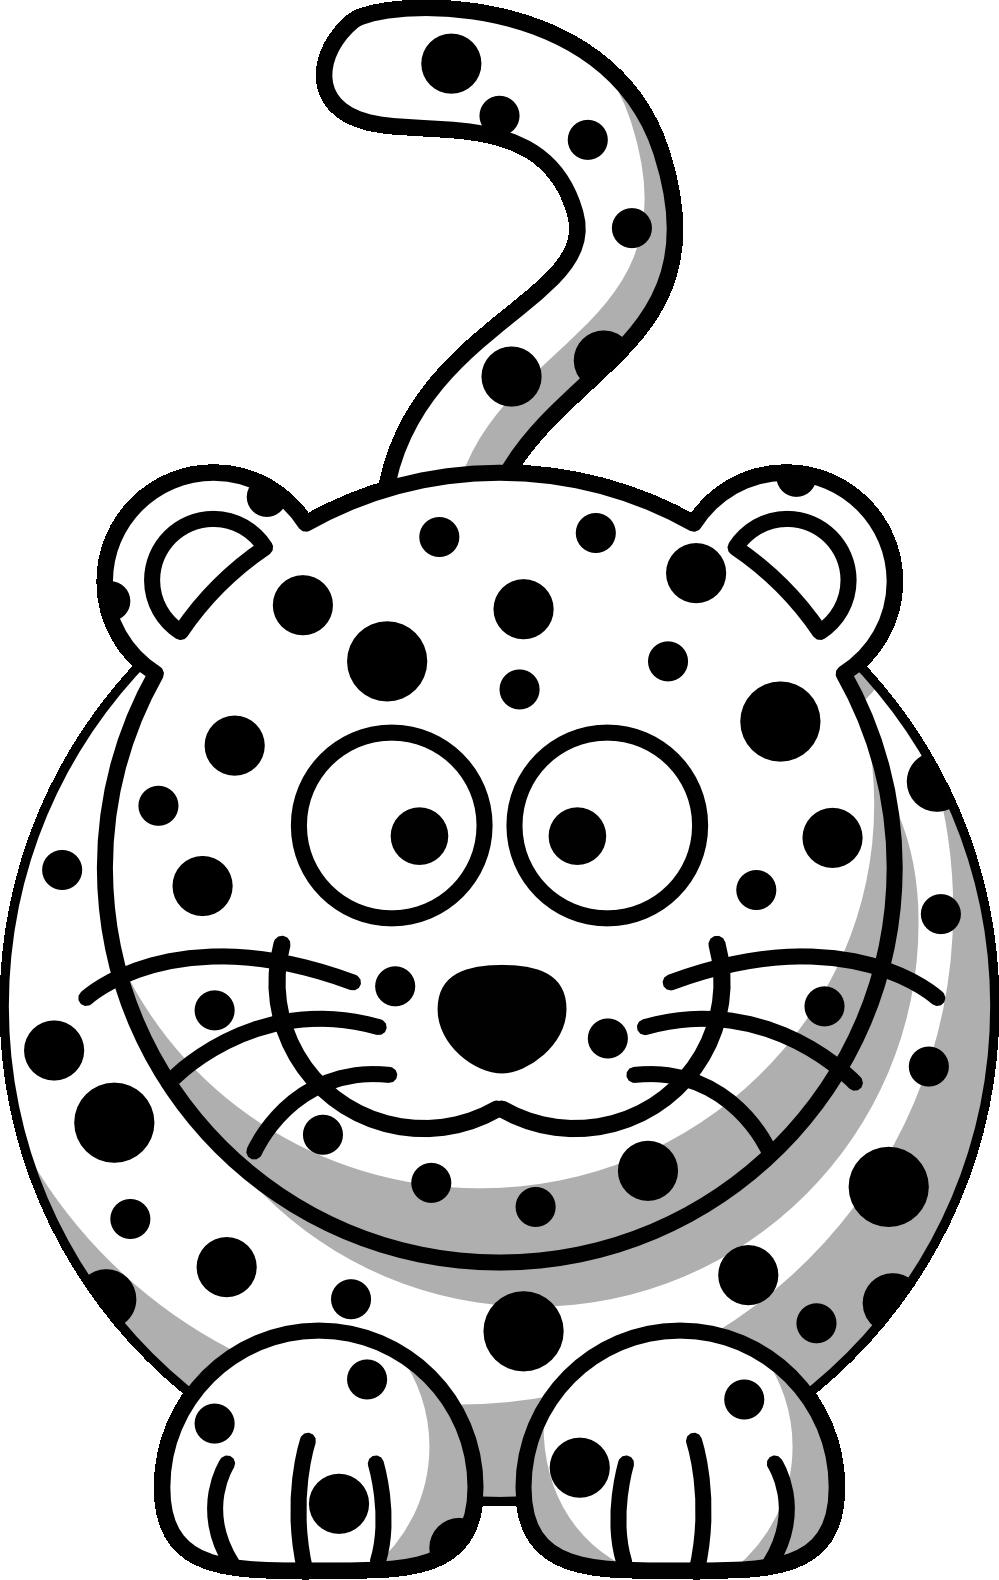 Amur Leopard clipart black and white Black Leopard For Download Art